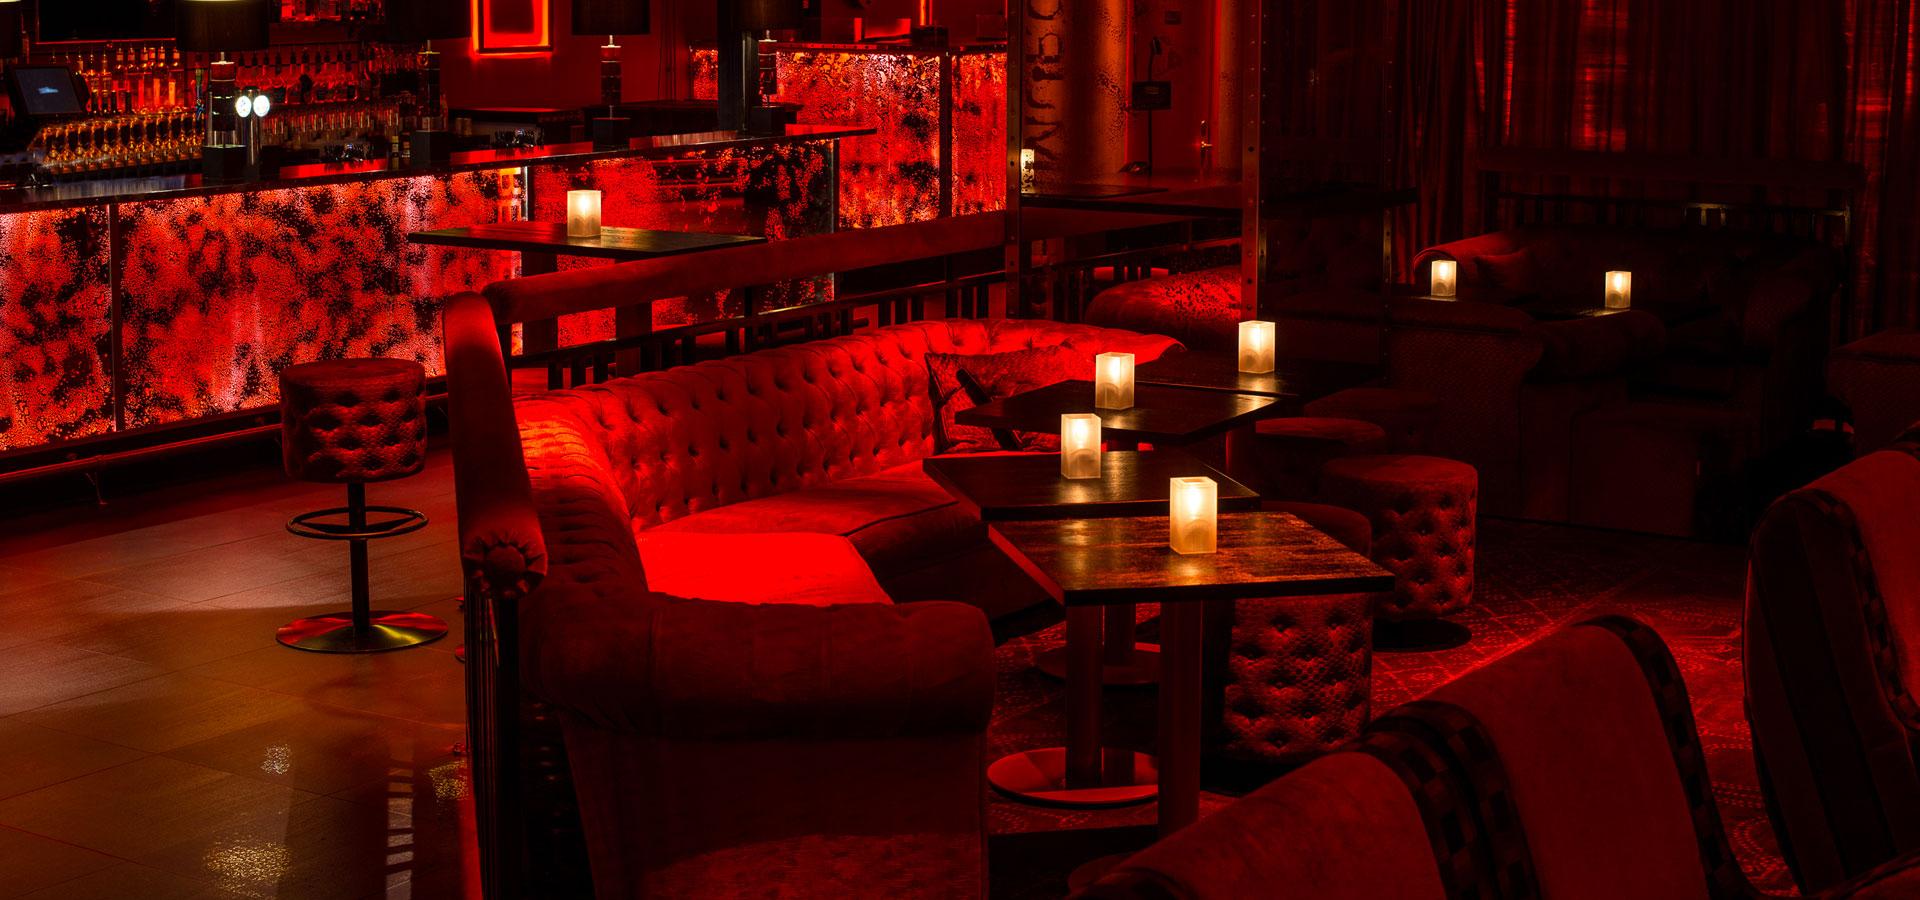 domingo-progettireferences_nightclub-red_jonkoping4